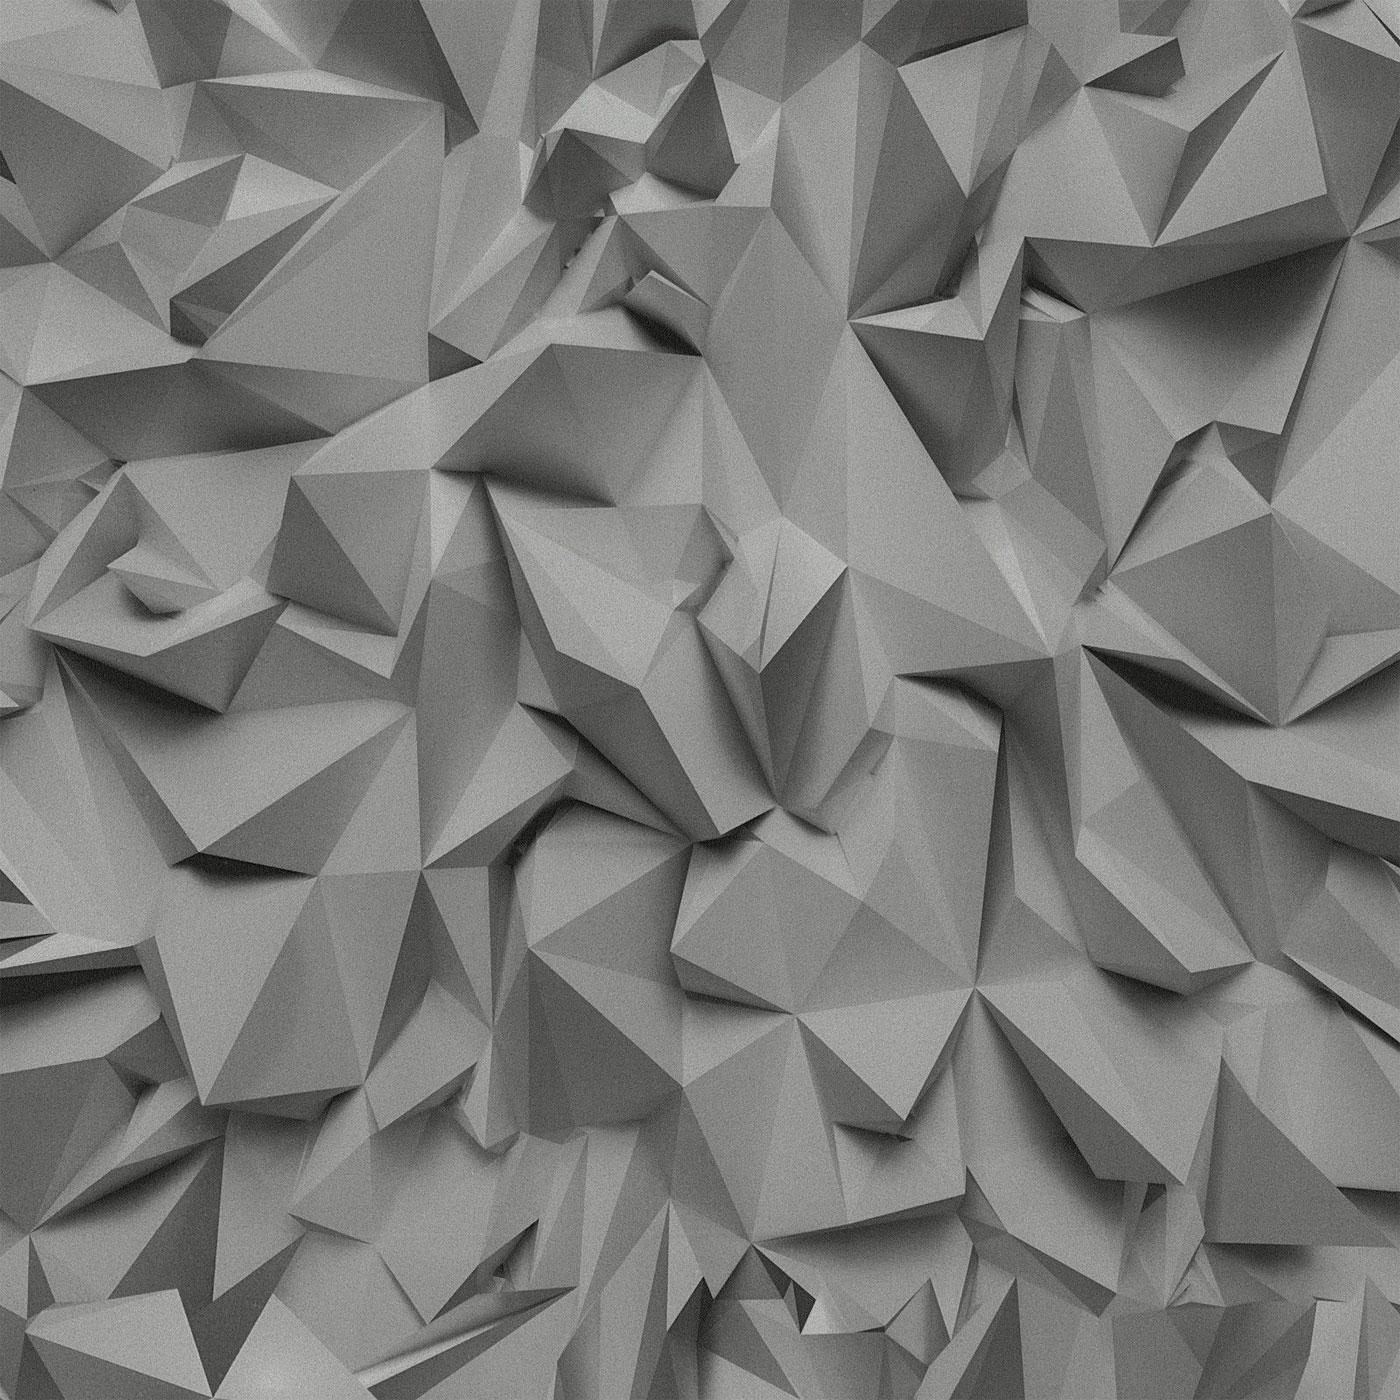 3D Effect Grey Silver Futuristic Metallic Vinyl Wallpaper EBay